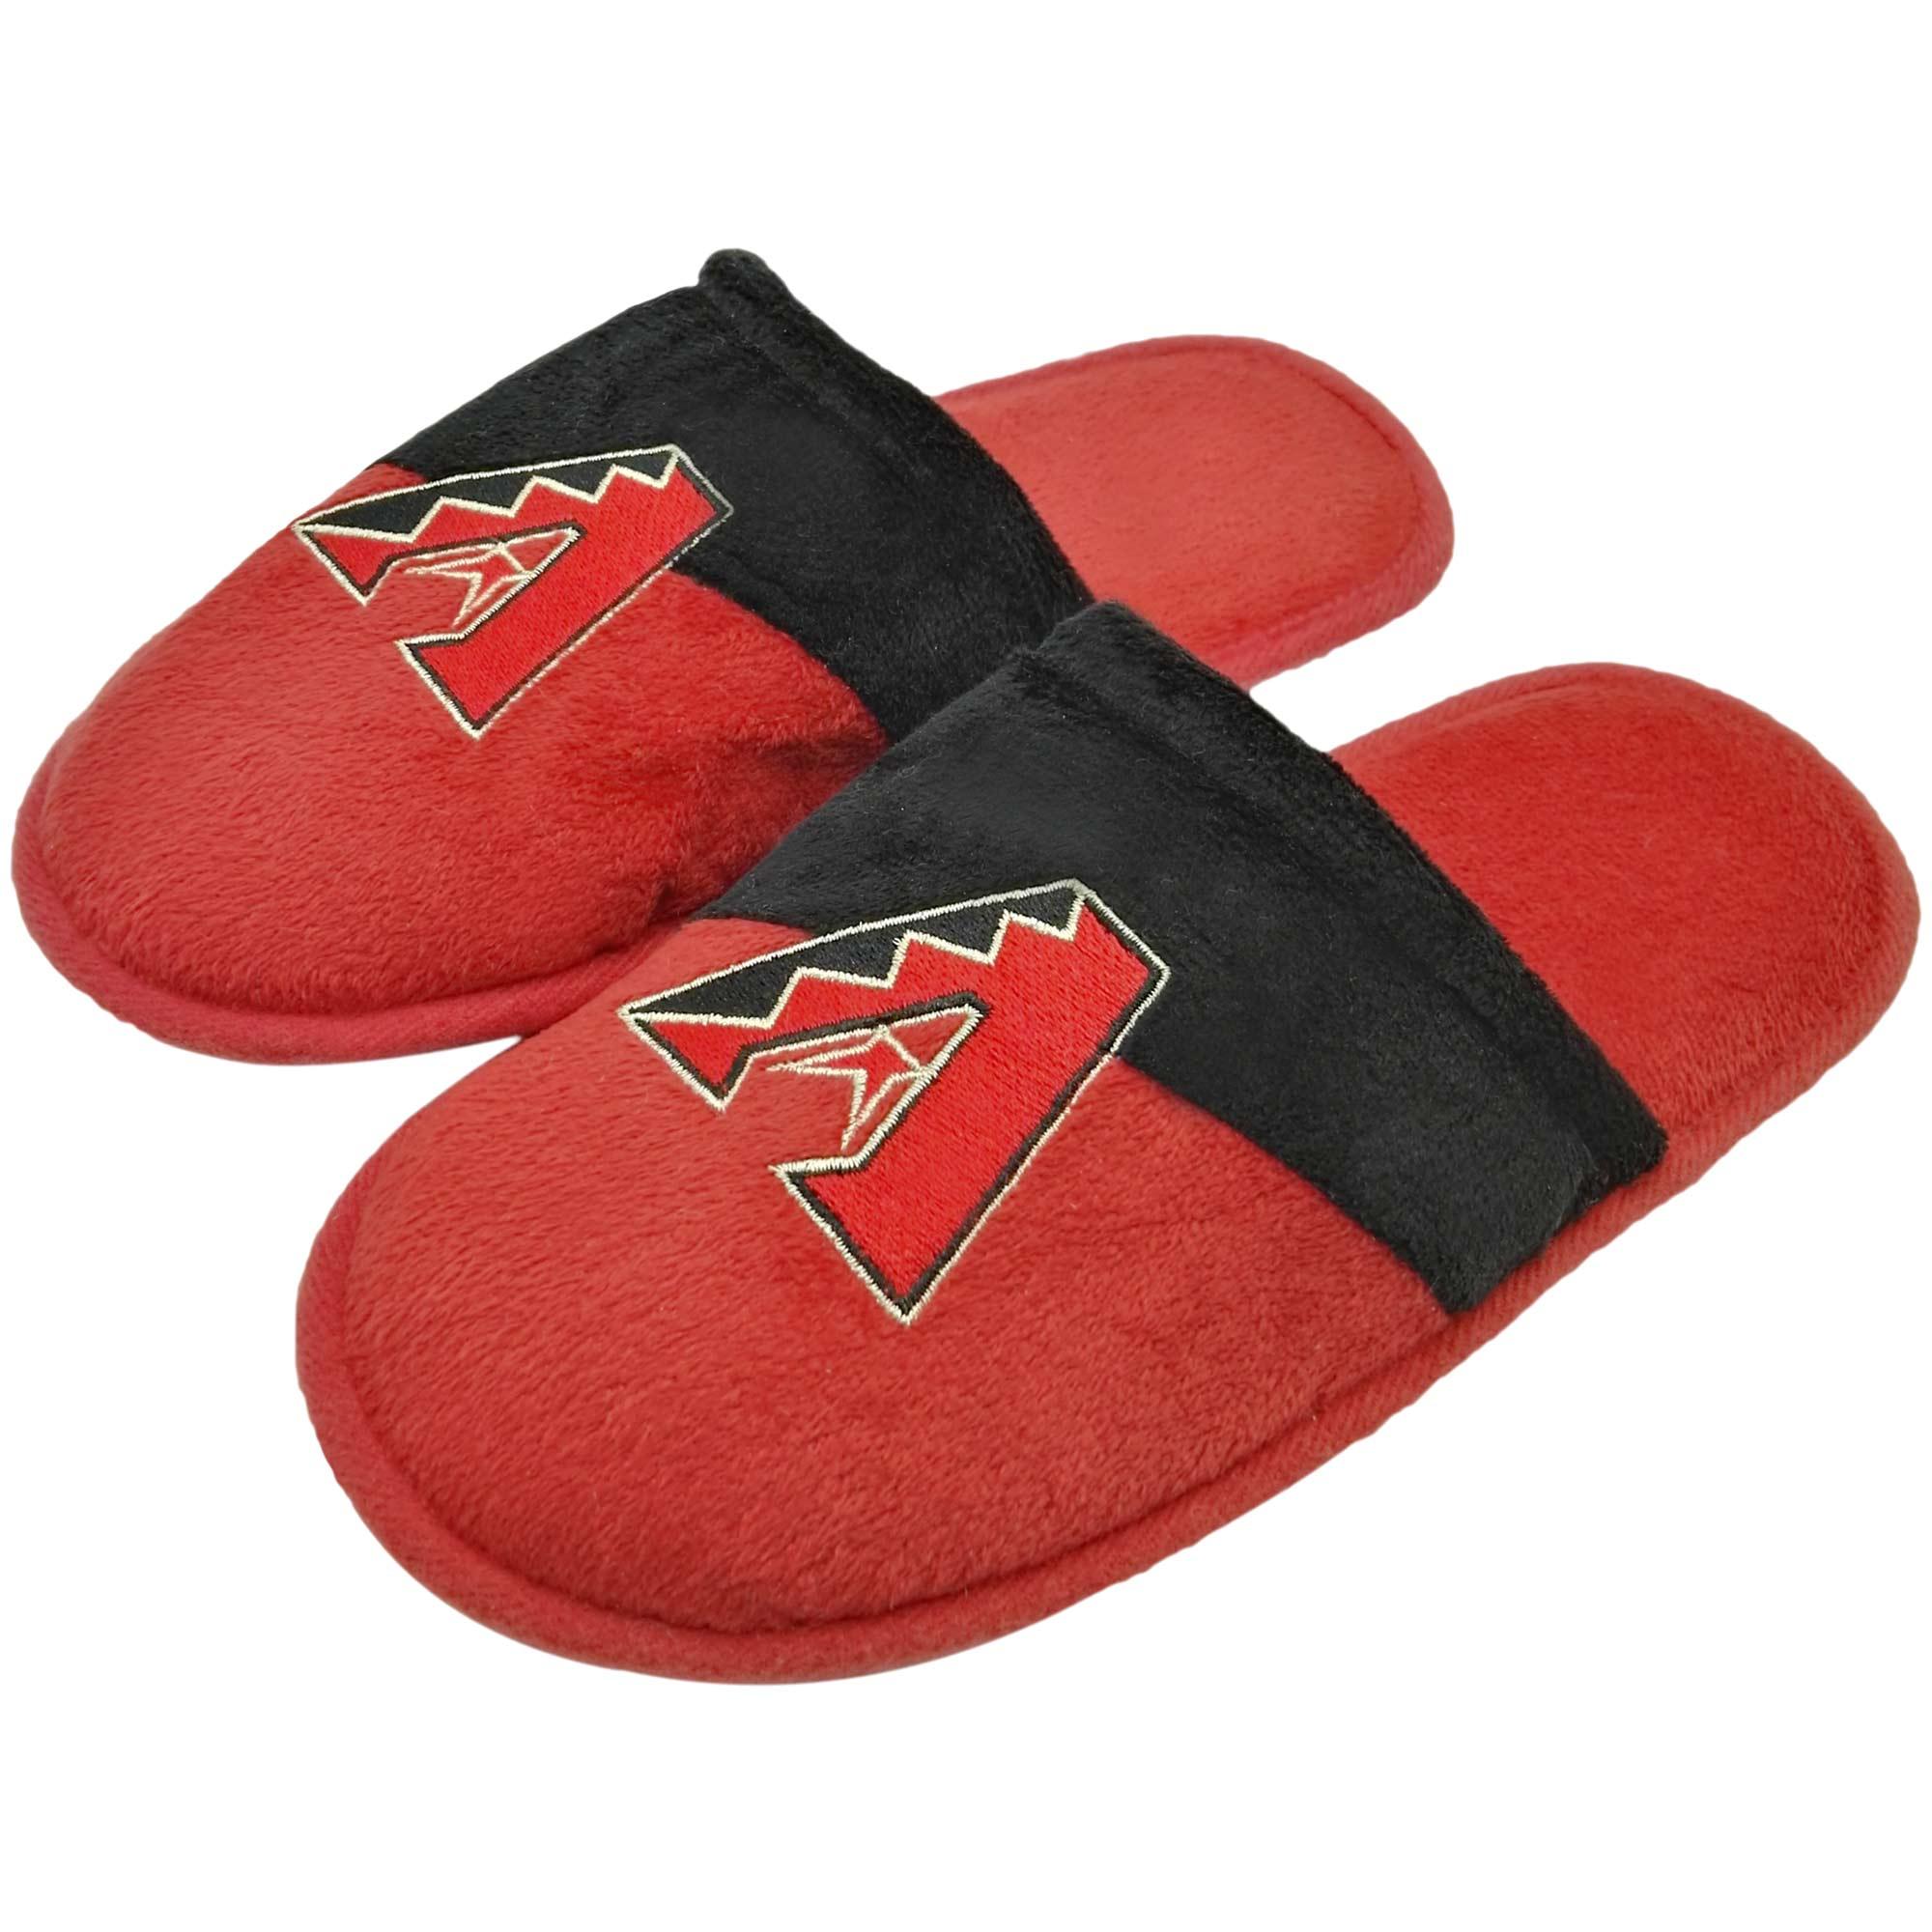 Arizona Diamondbacks Youth Slide Slippers